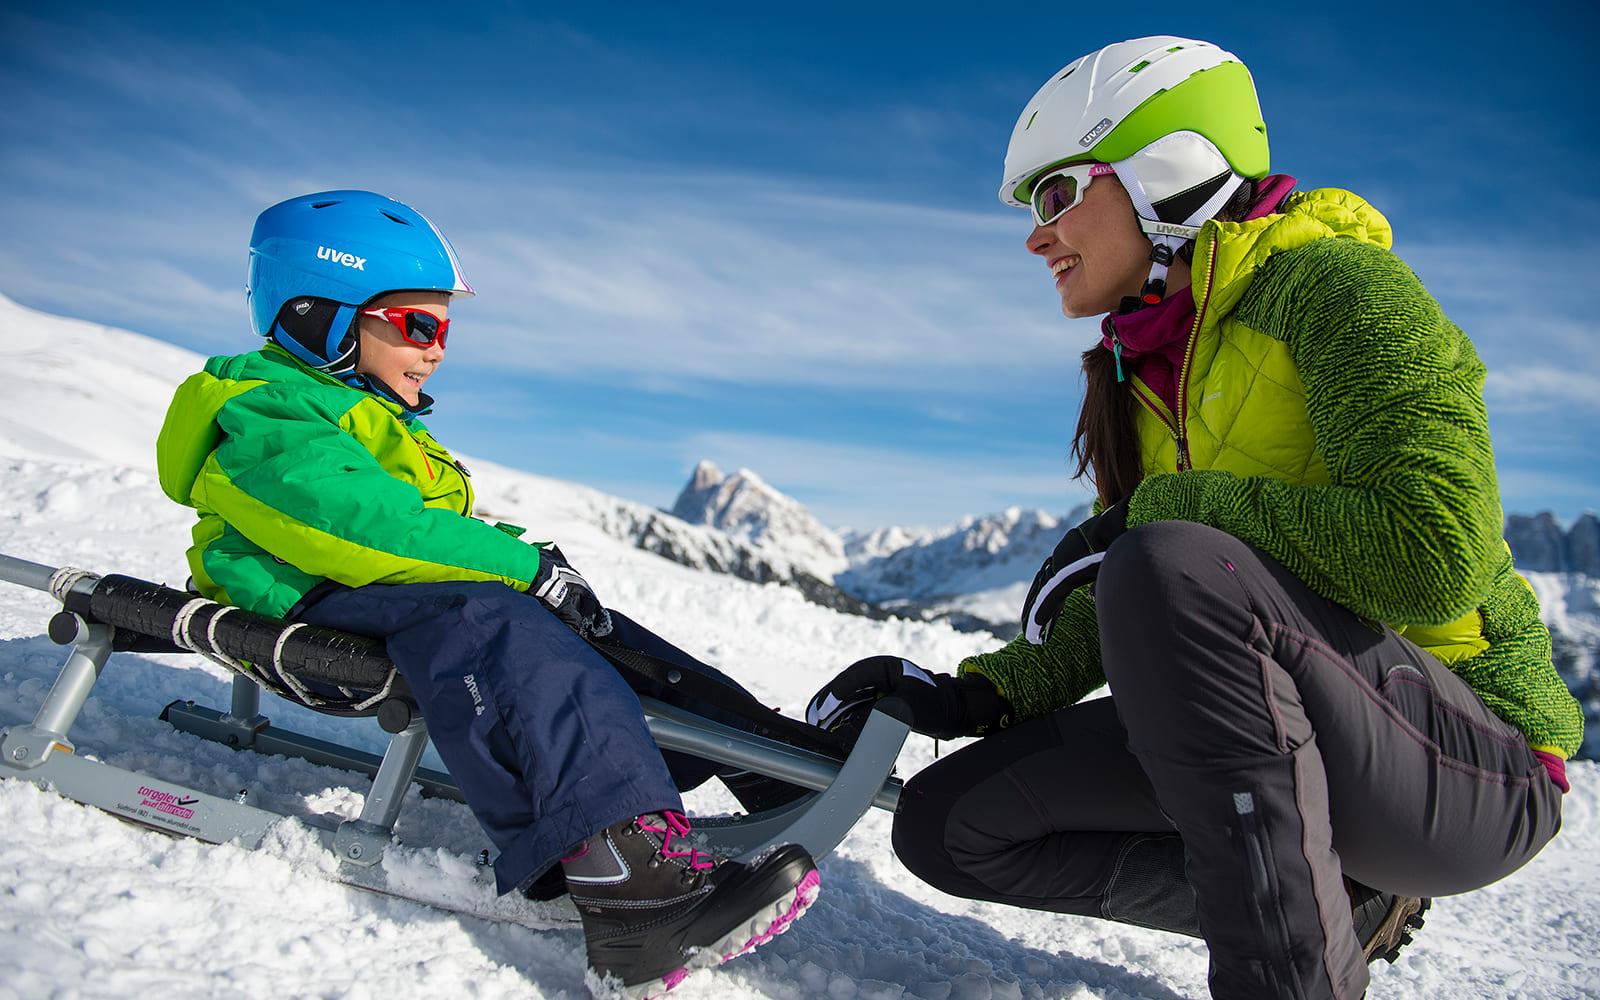 Residence Nives - Familienurlaub im Schnee